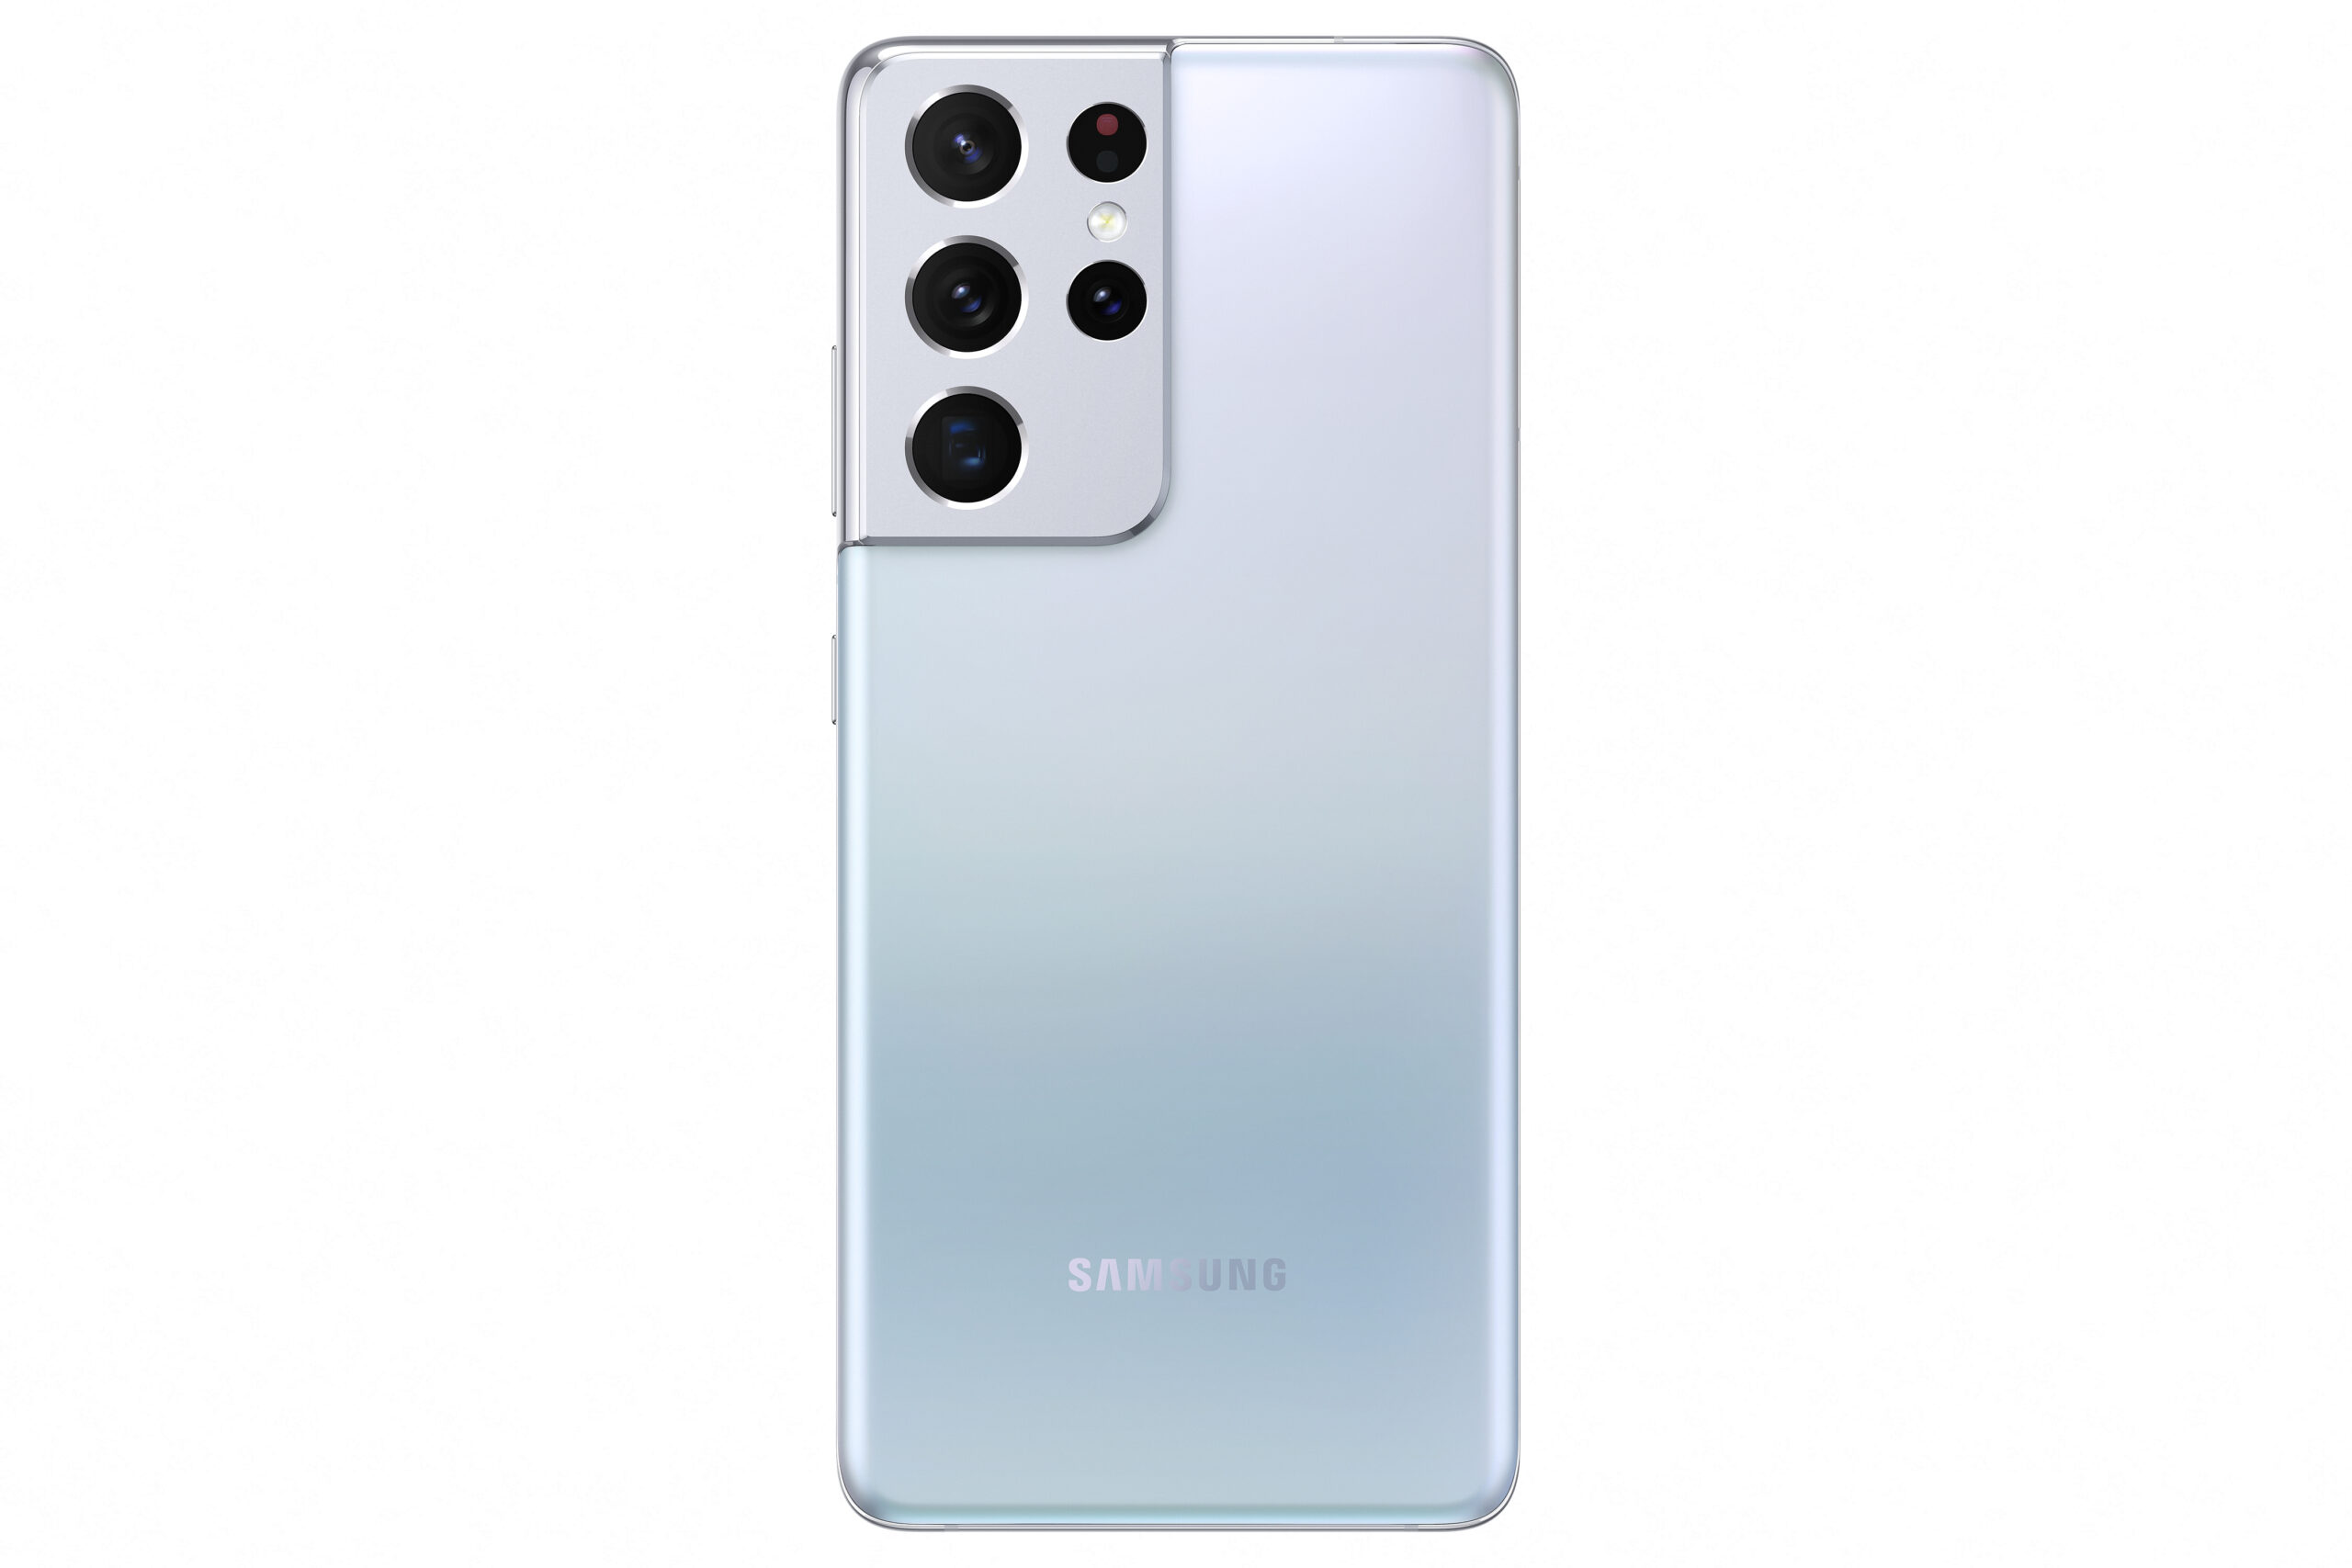 "Samsung Galaxy S21 Ultra 5G SM-G998 17,3 cm (6.8"") Dobbel SIM Android 11 USB Type-C 12 GB 128 GB 5000 mAh Sølv"